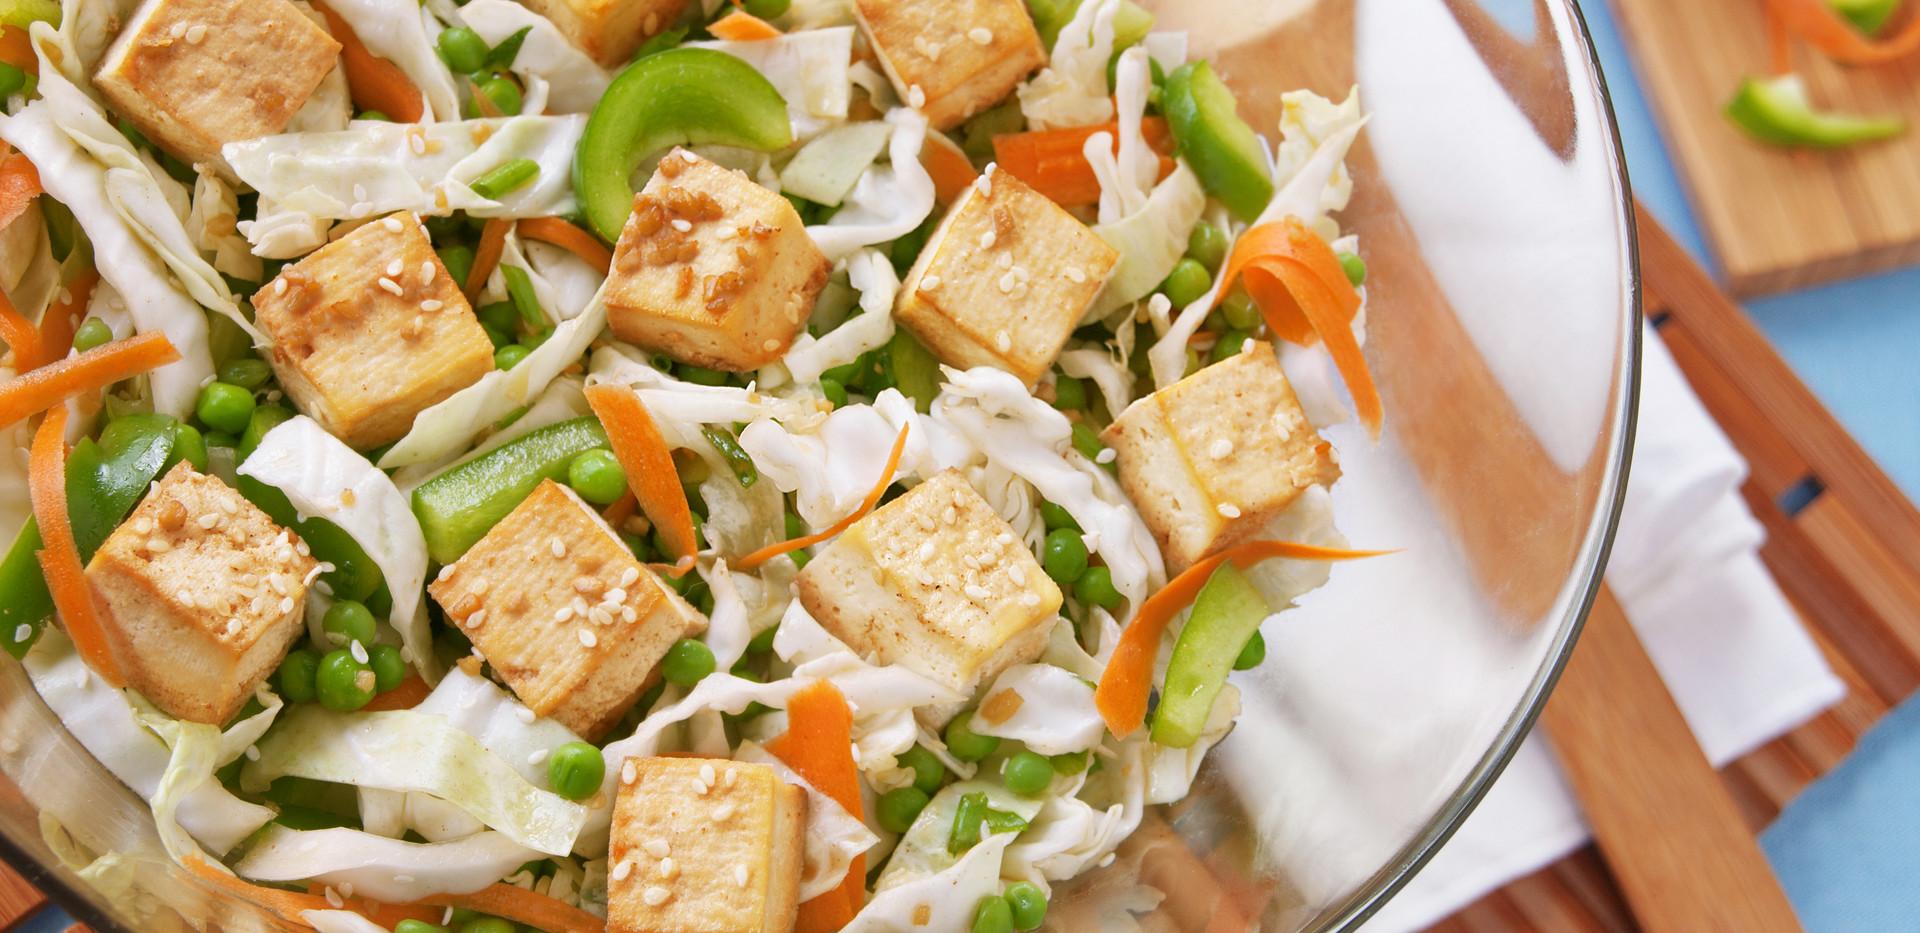 Teriyaki-Tofu-Salad_74126802043.jpg